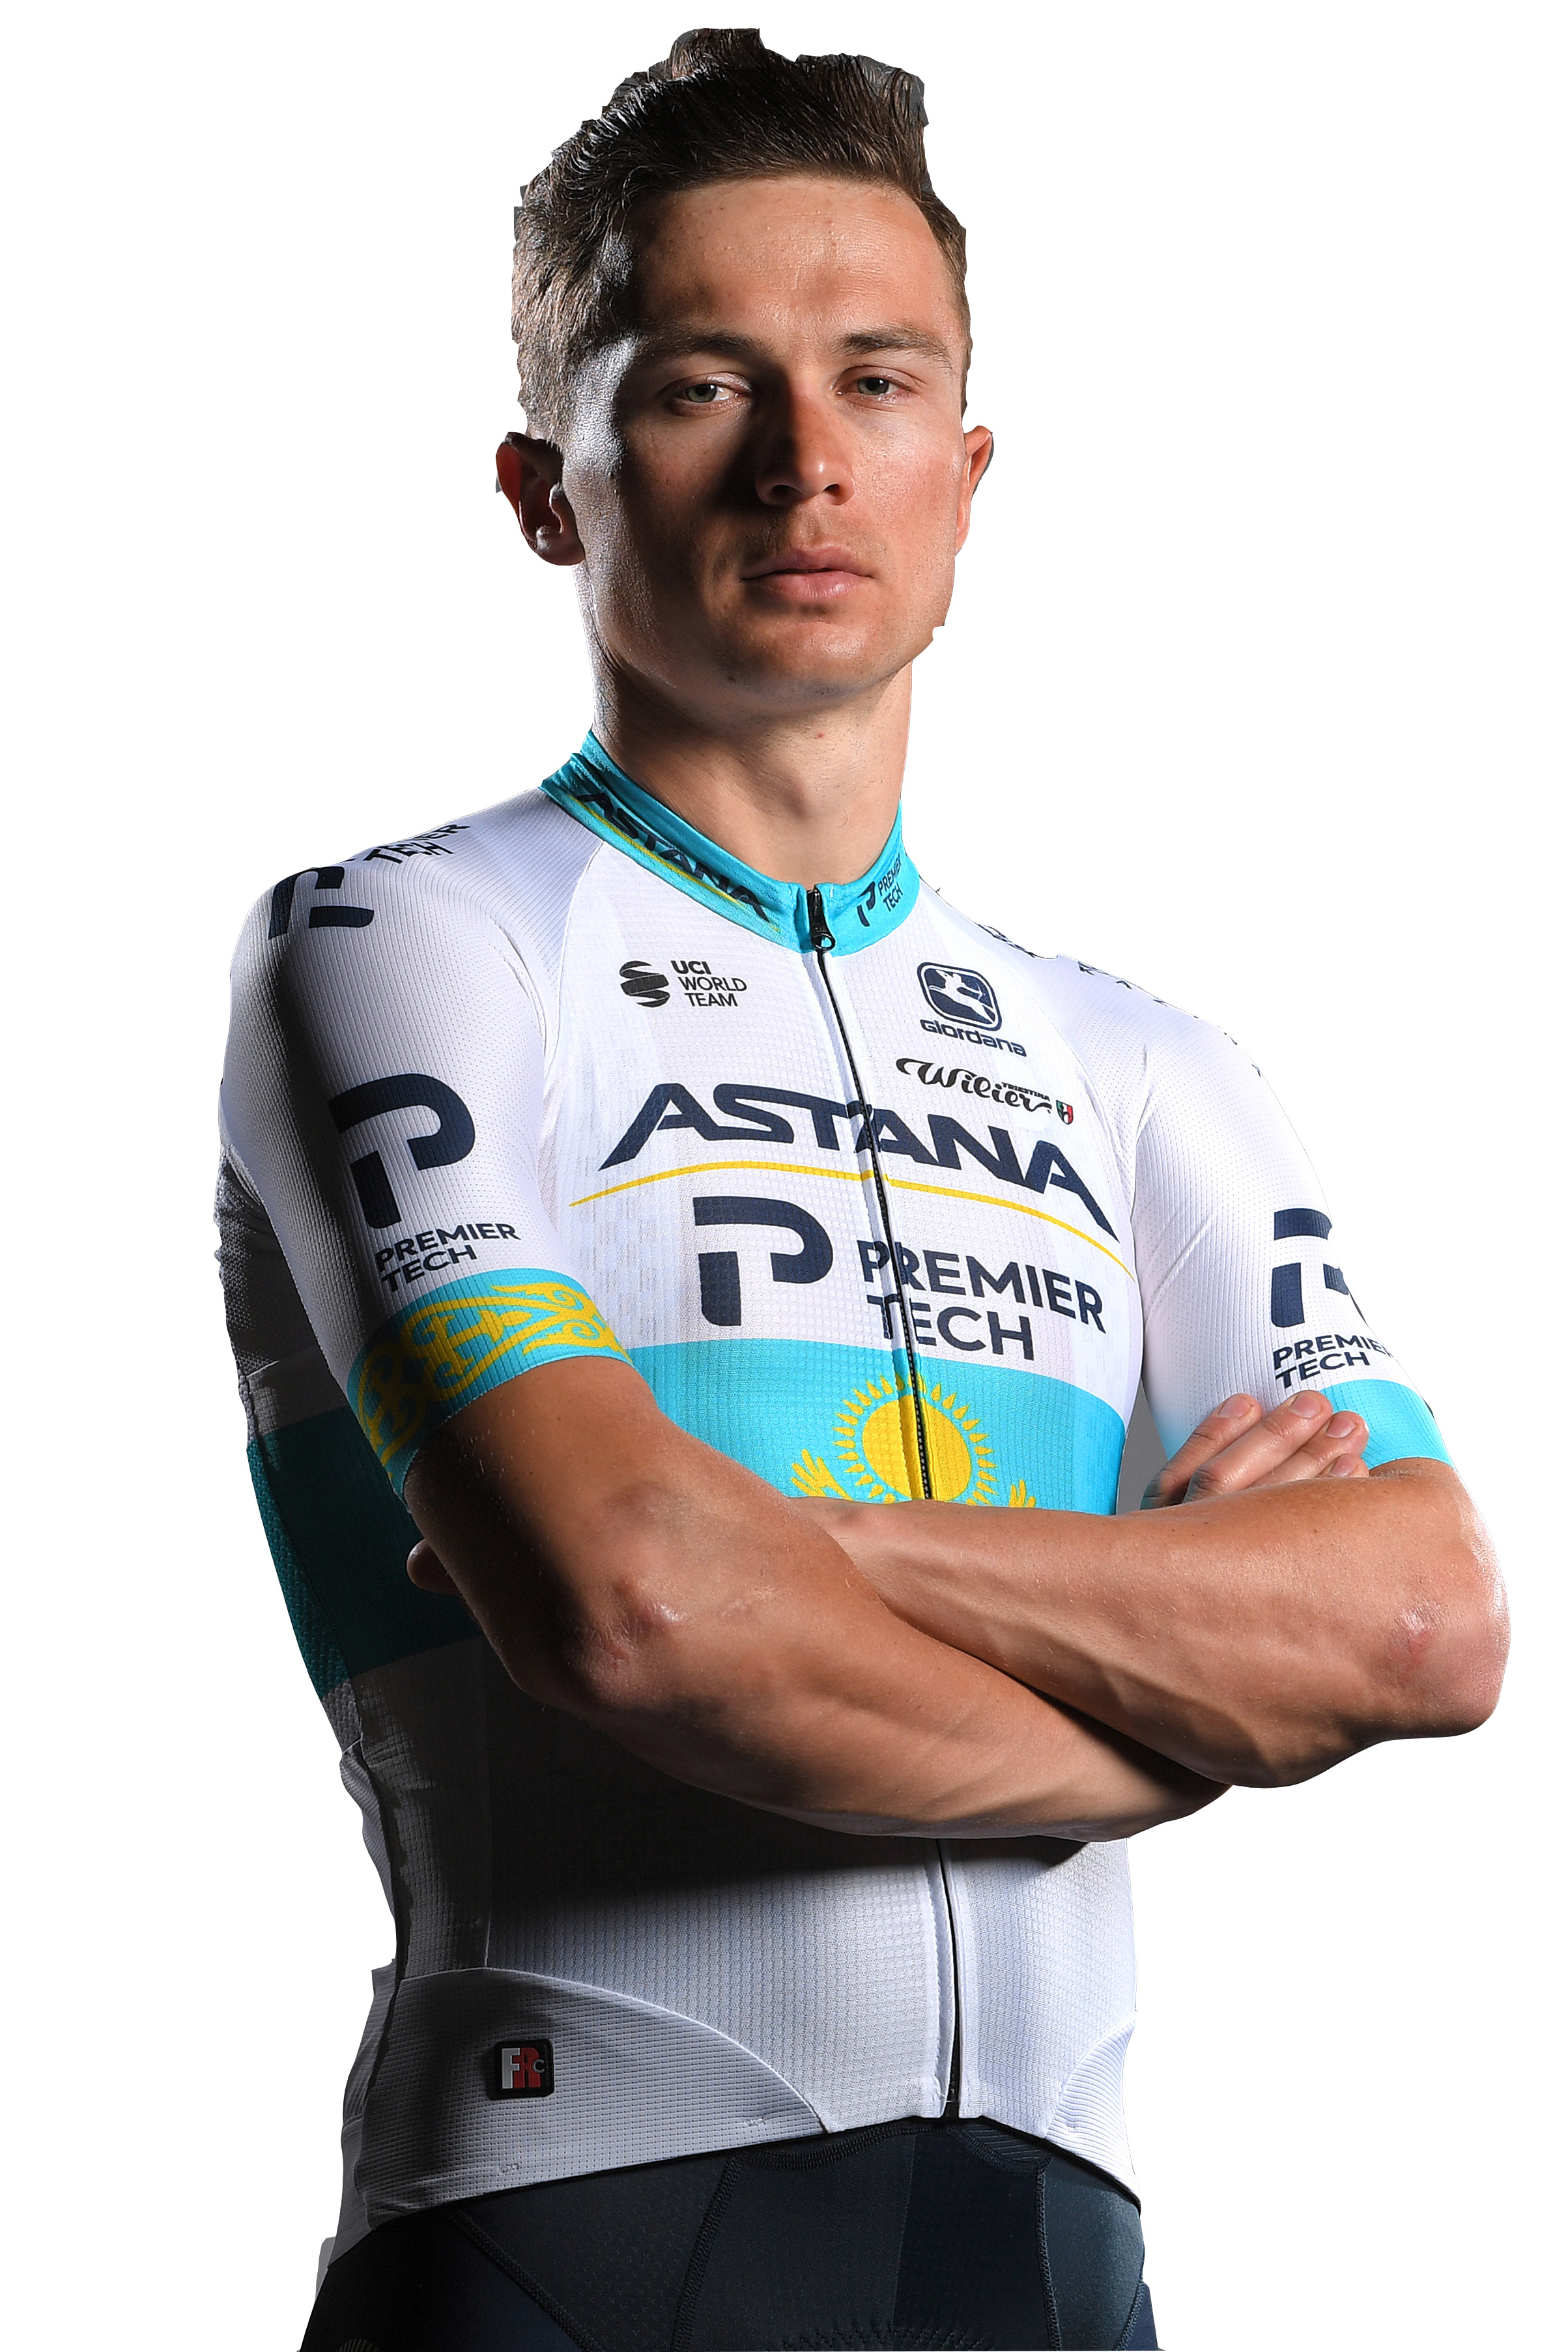 Alexey Lutsenko Astana Premier Tech 2021